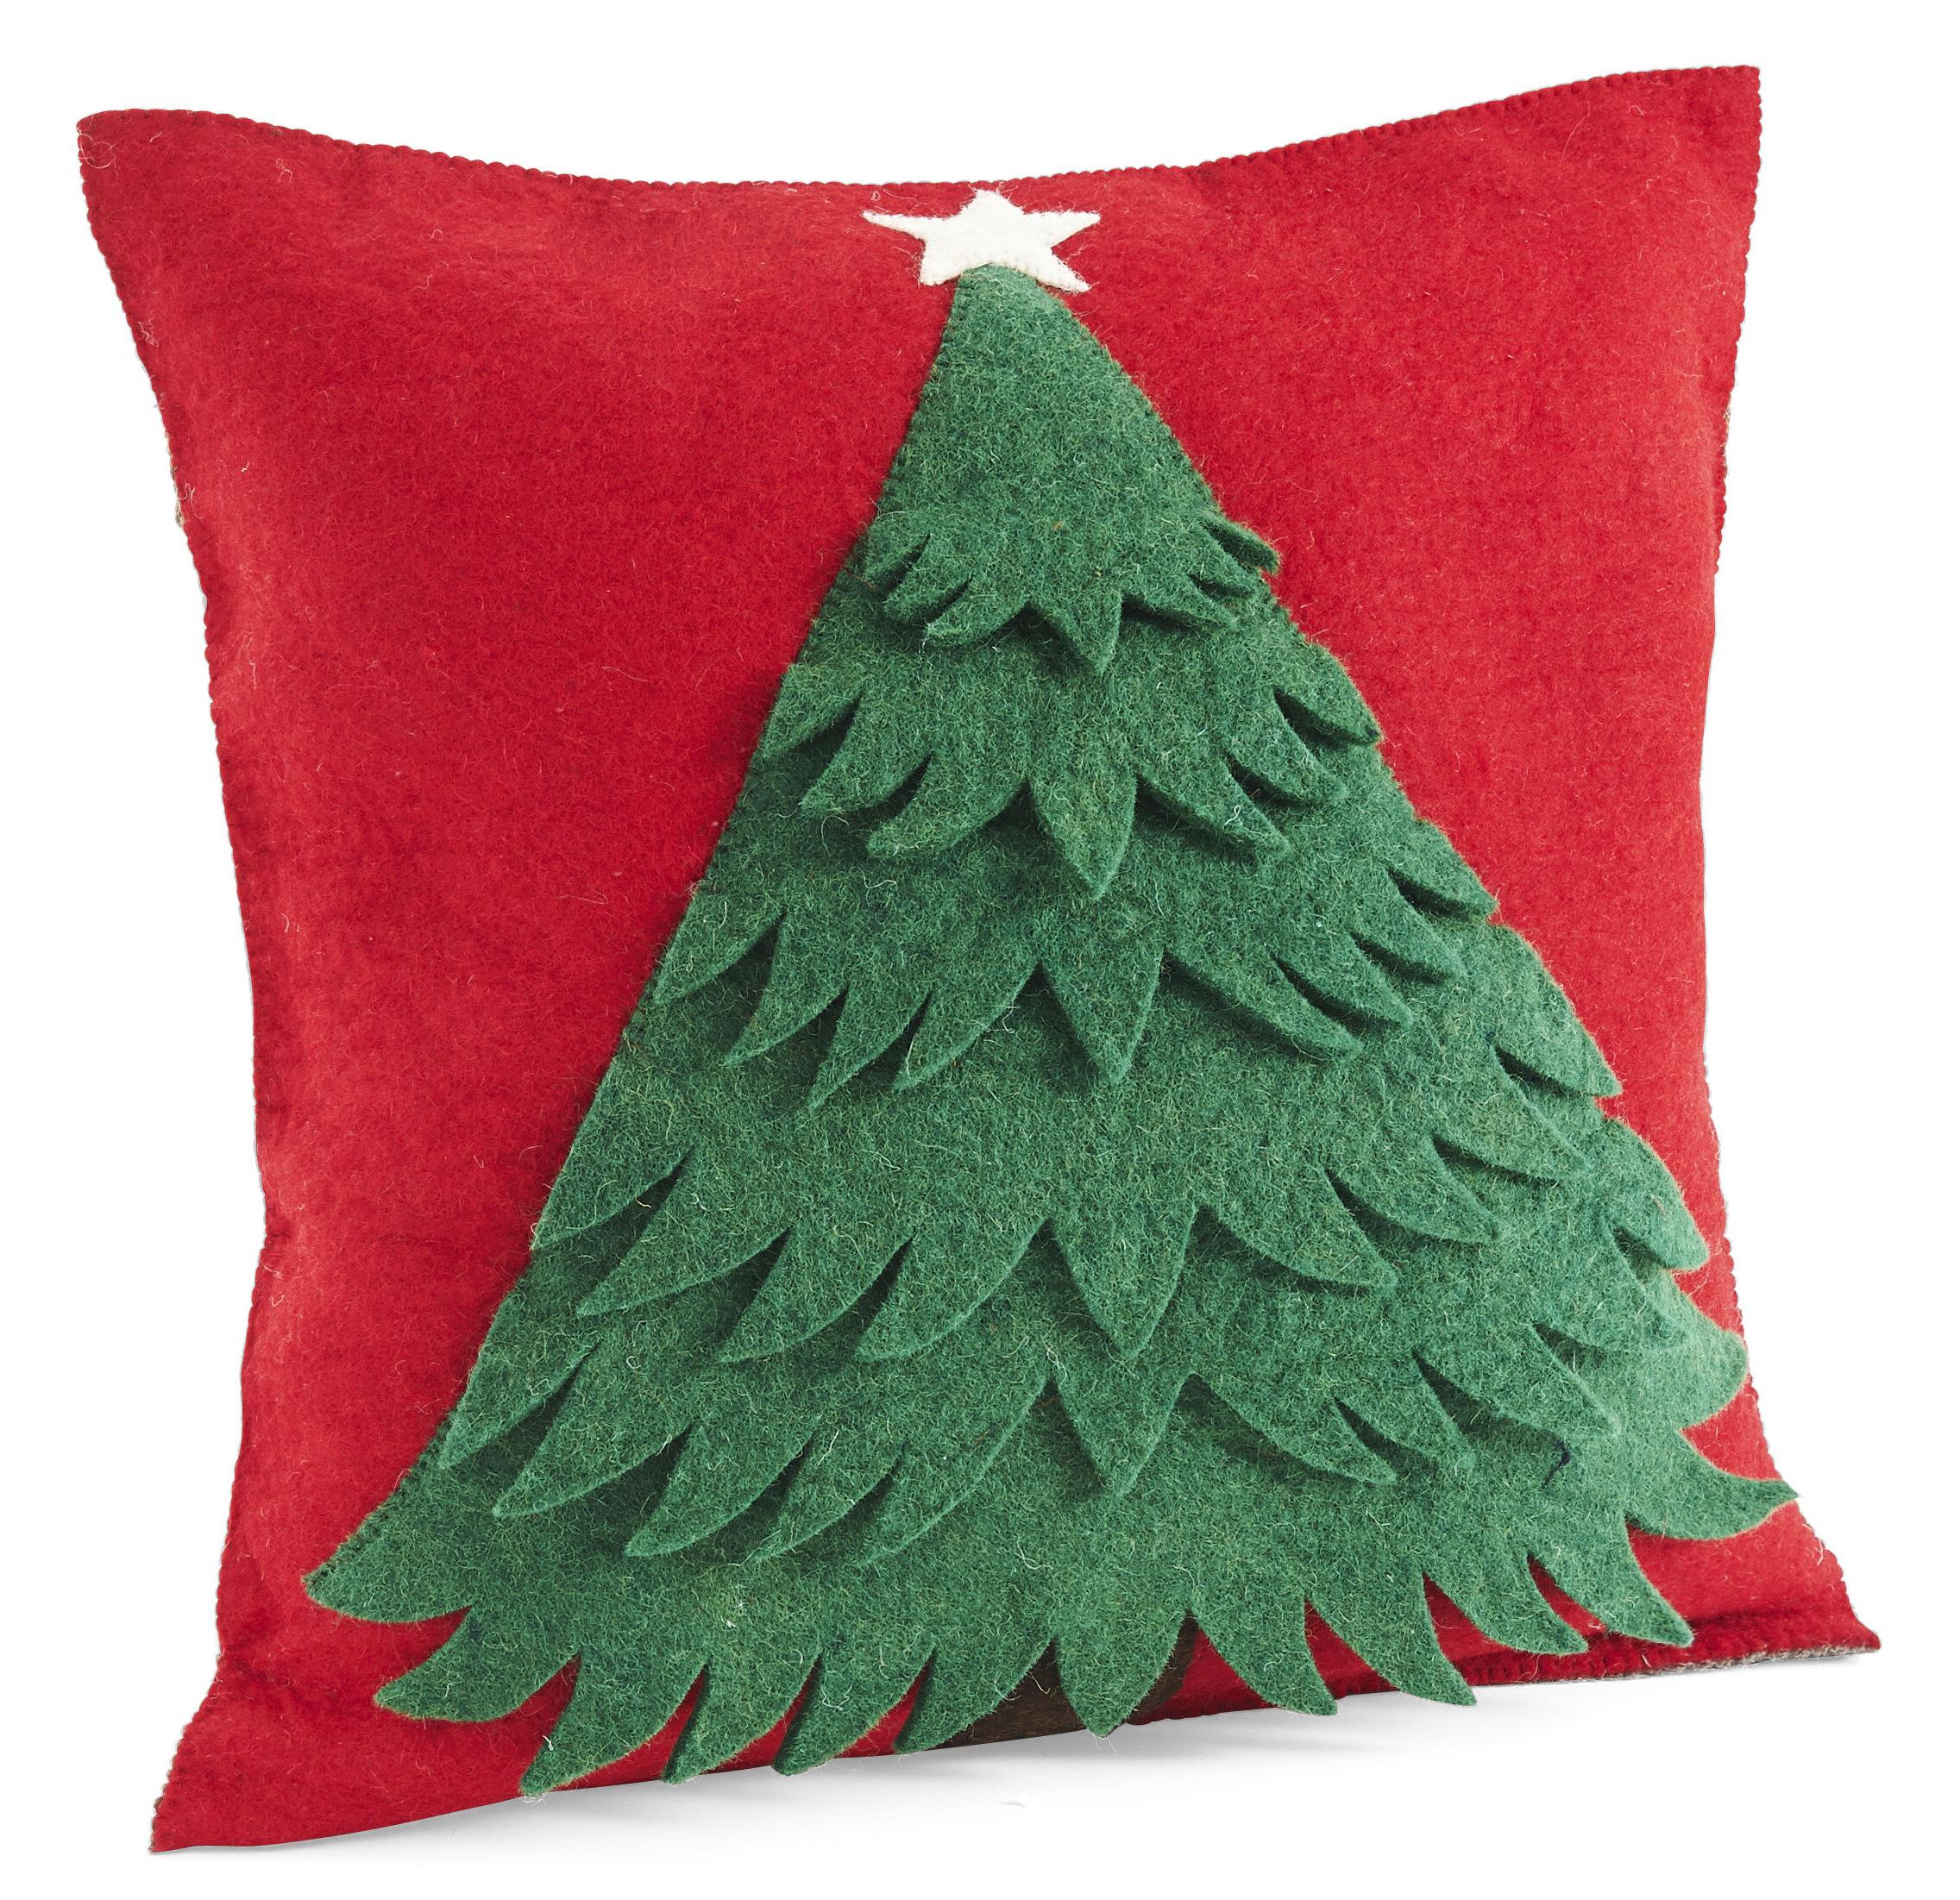 The Holiday Aisle Hinton Charterhouse Handmade Christmas Wool Throw Pillow Wayfair